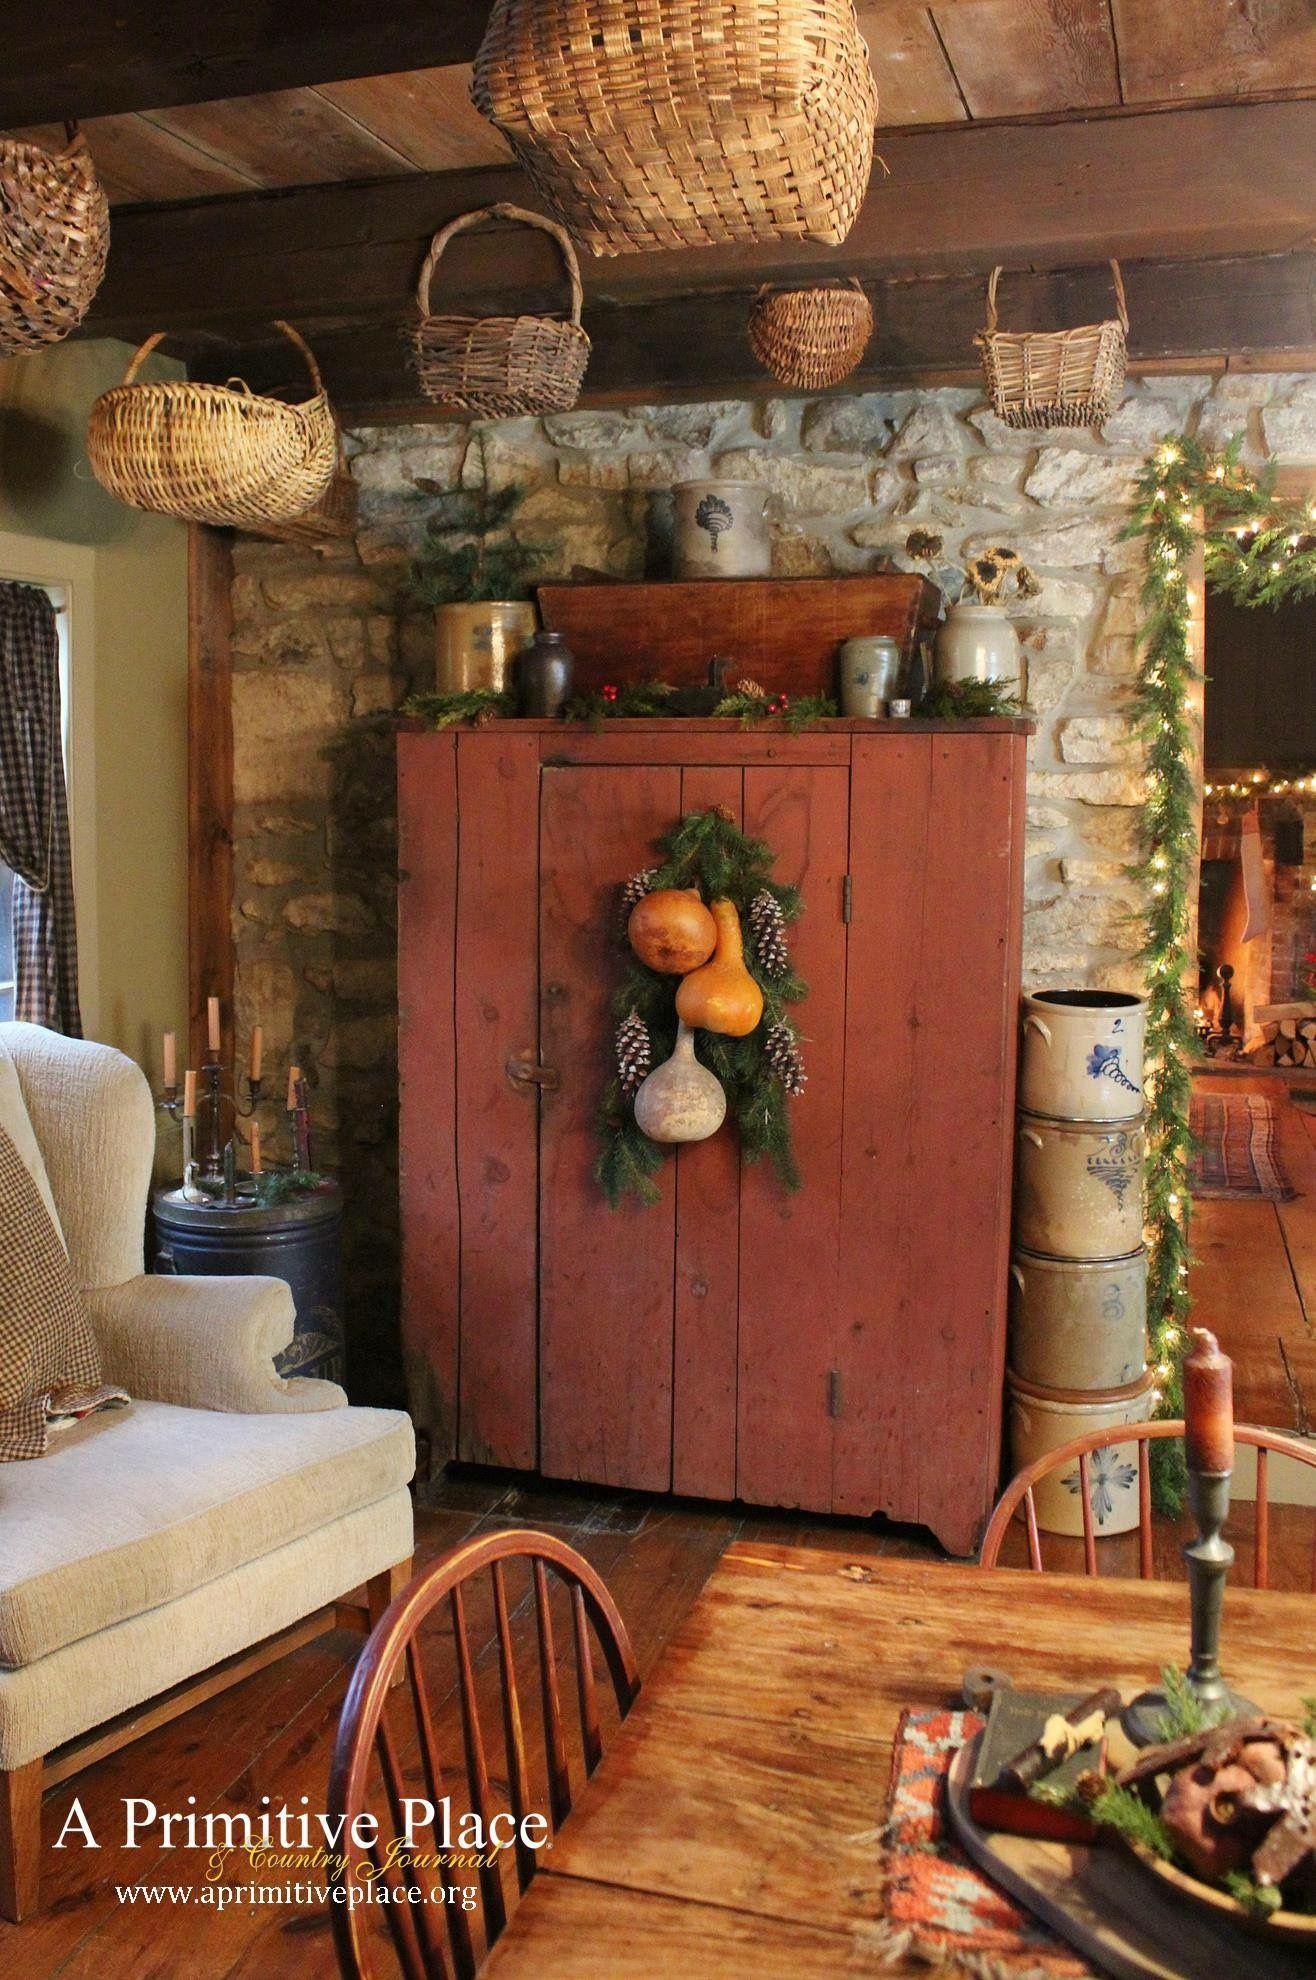 Pin de isa en decoración | Pinterest | Cocinas rústicas, Casas ...